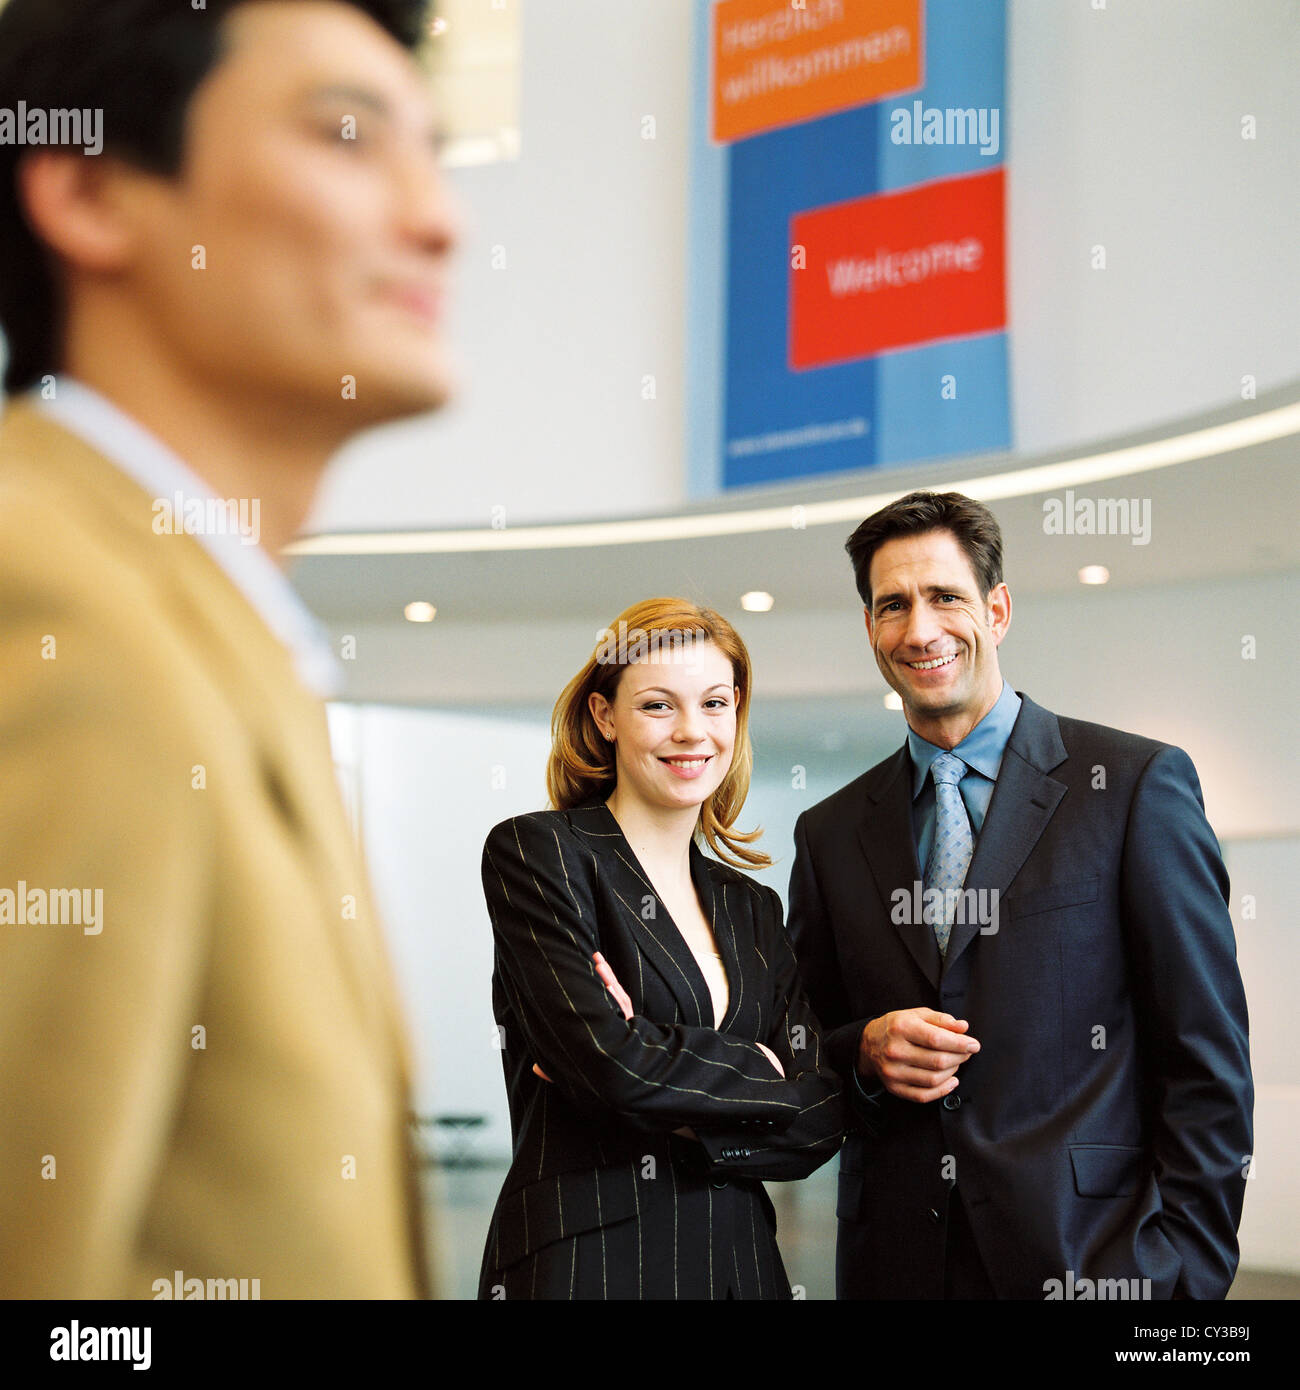 Manager Business Mann Frau Gruppe lizenzfrei außer anzeigen und Reklametafeln Stockbild